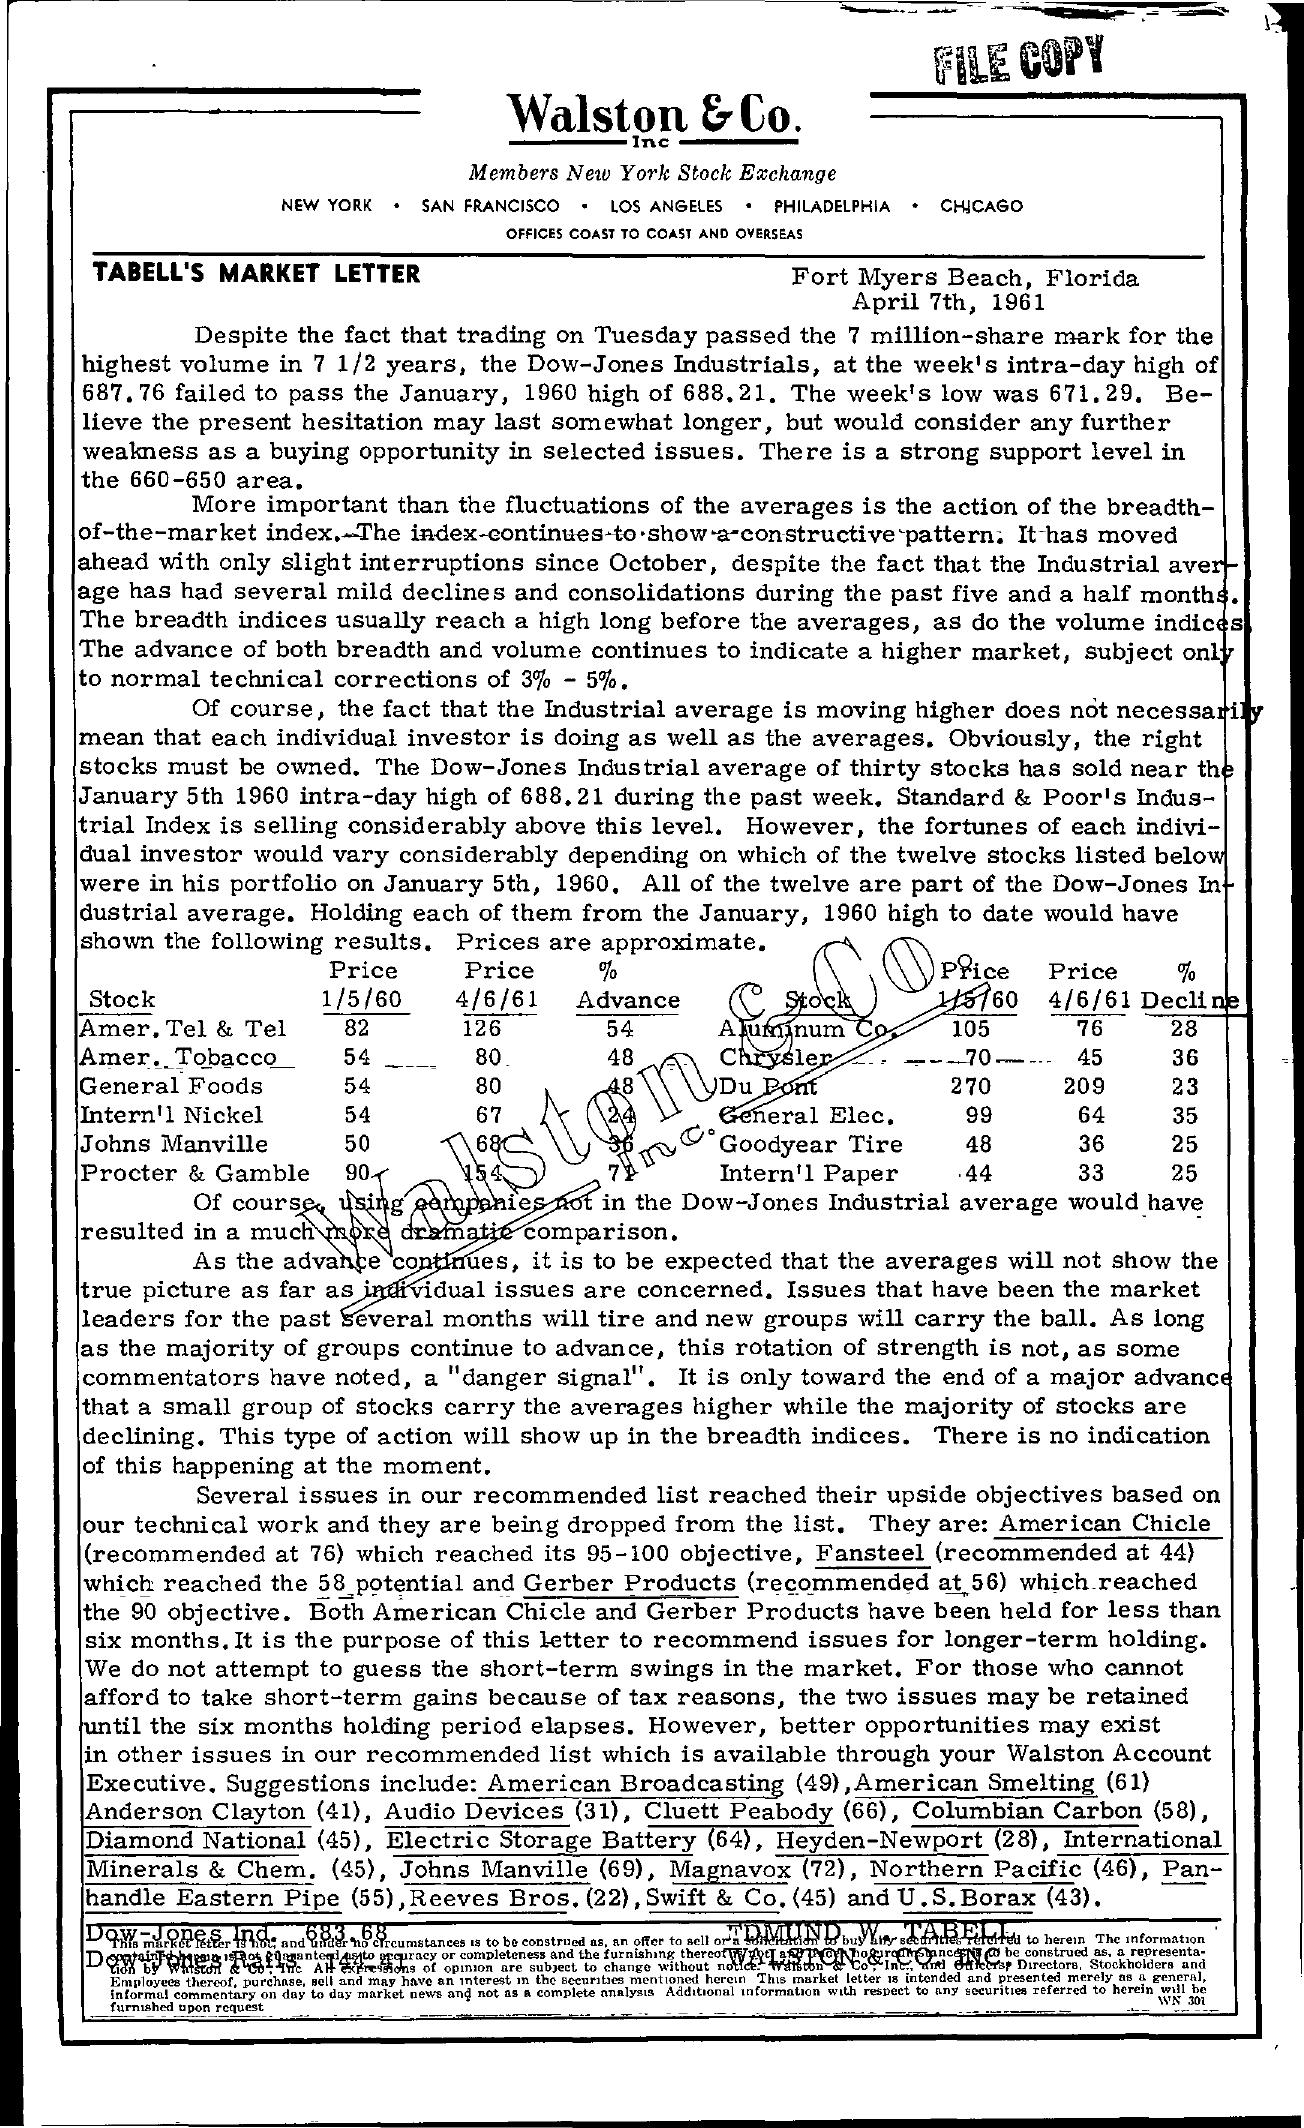 Tabell's Market Letter - April 07, 1961